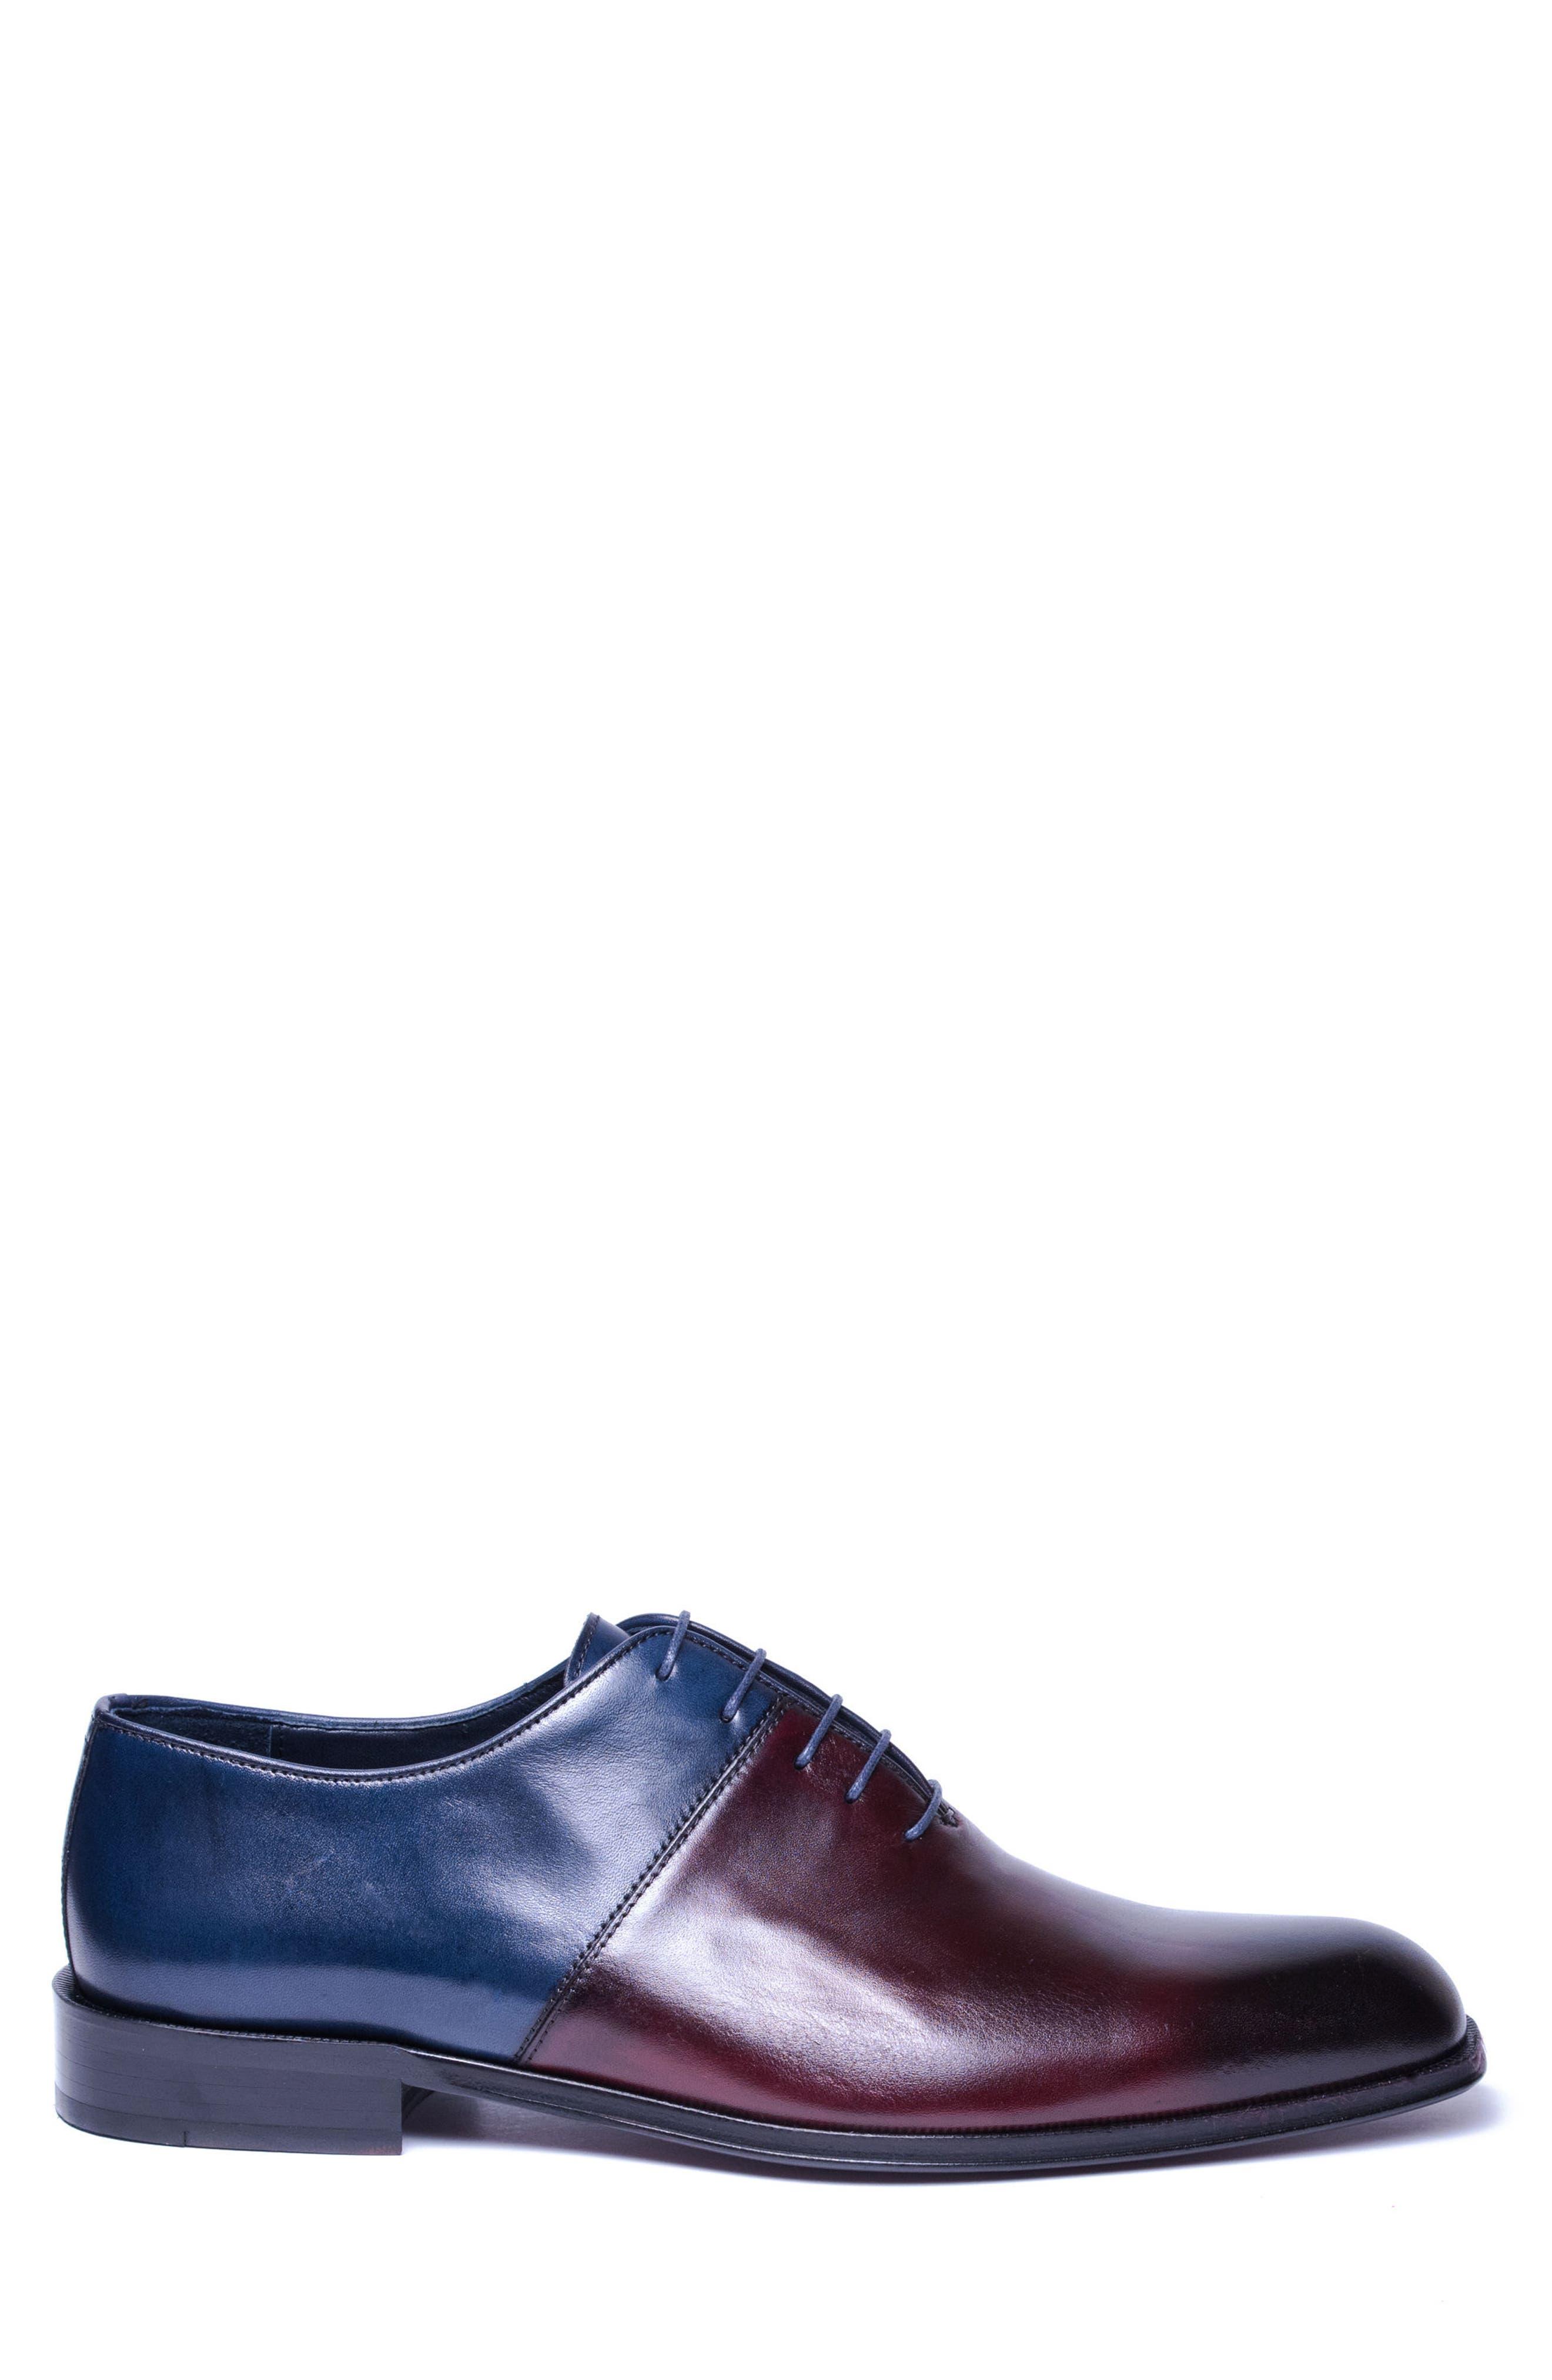 Wyatt Colorblocked Whole Cut Shoe,                             Alternate thumbnail 3, color,                             Burgundy Leather